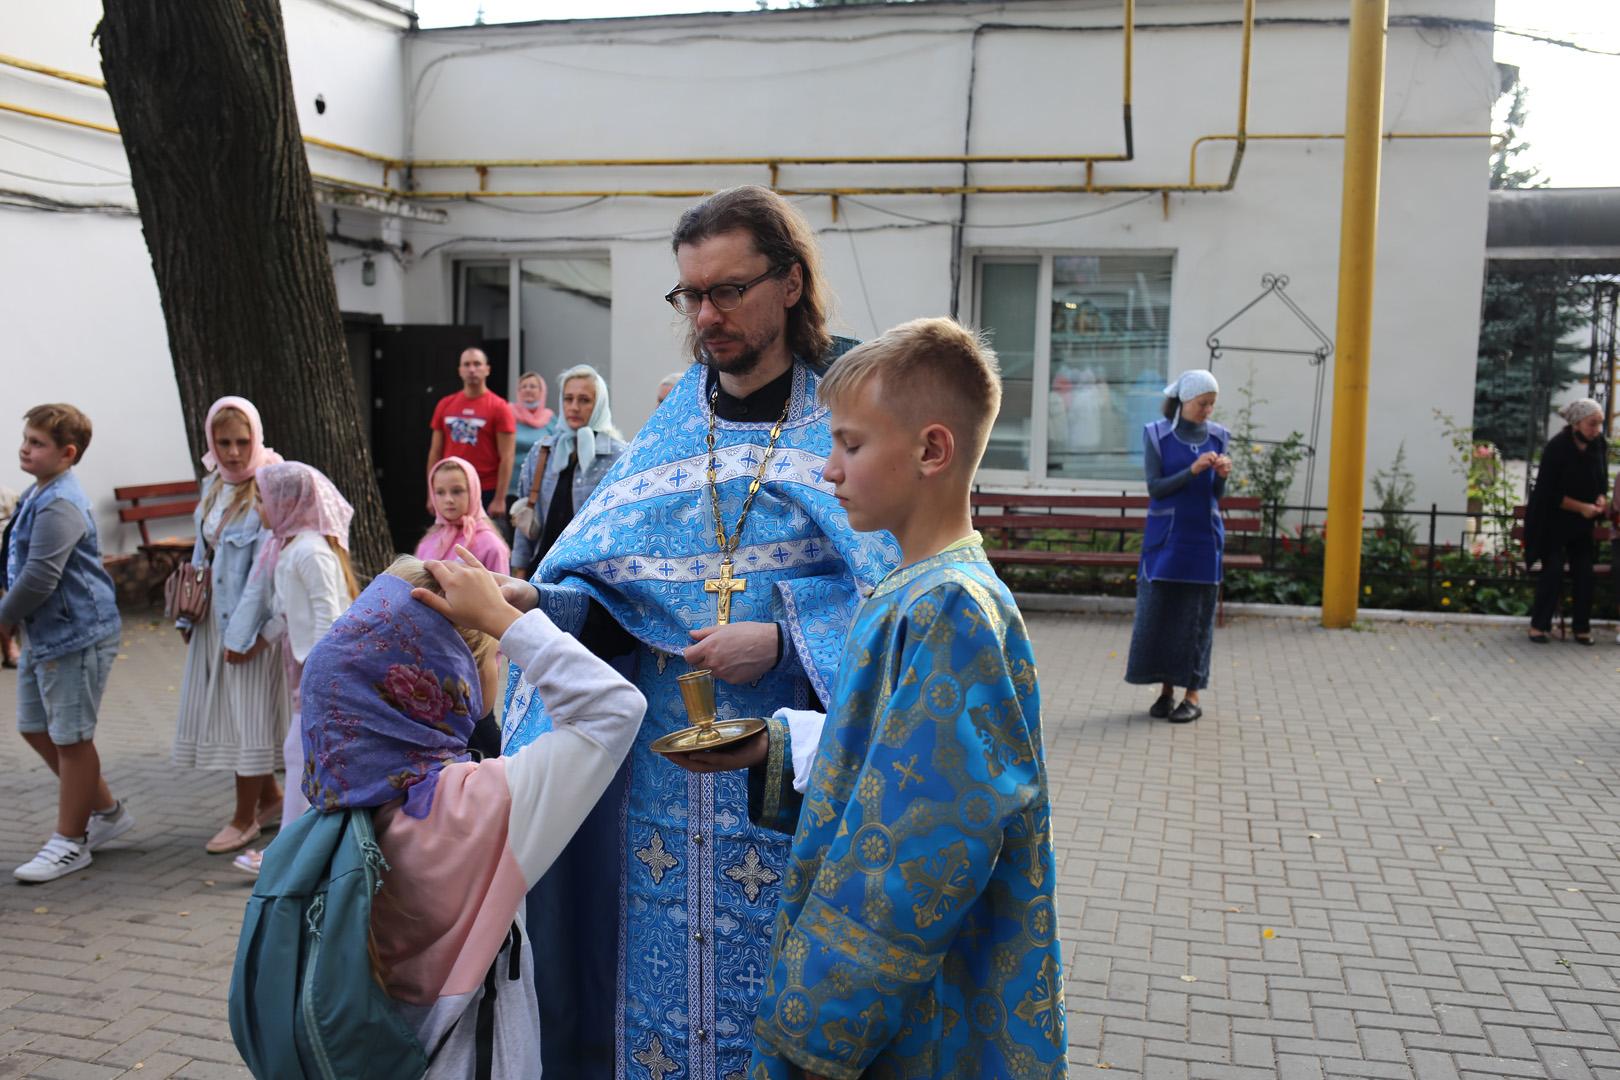 http://monuspen.ru/photoreports/c921fa66433a9104090f5865f55396af.jpg